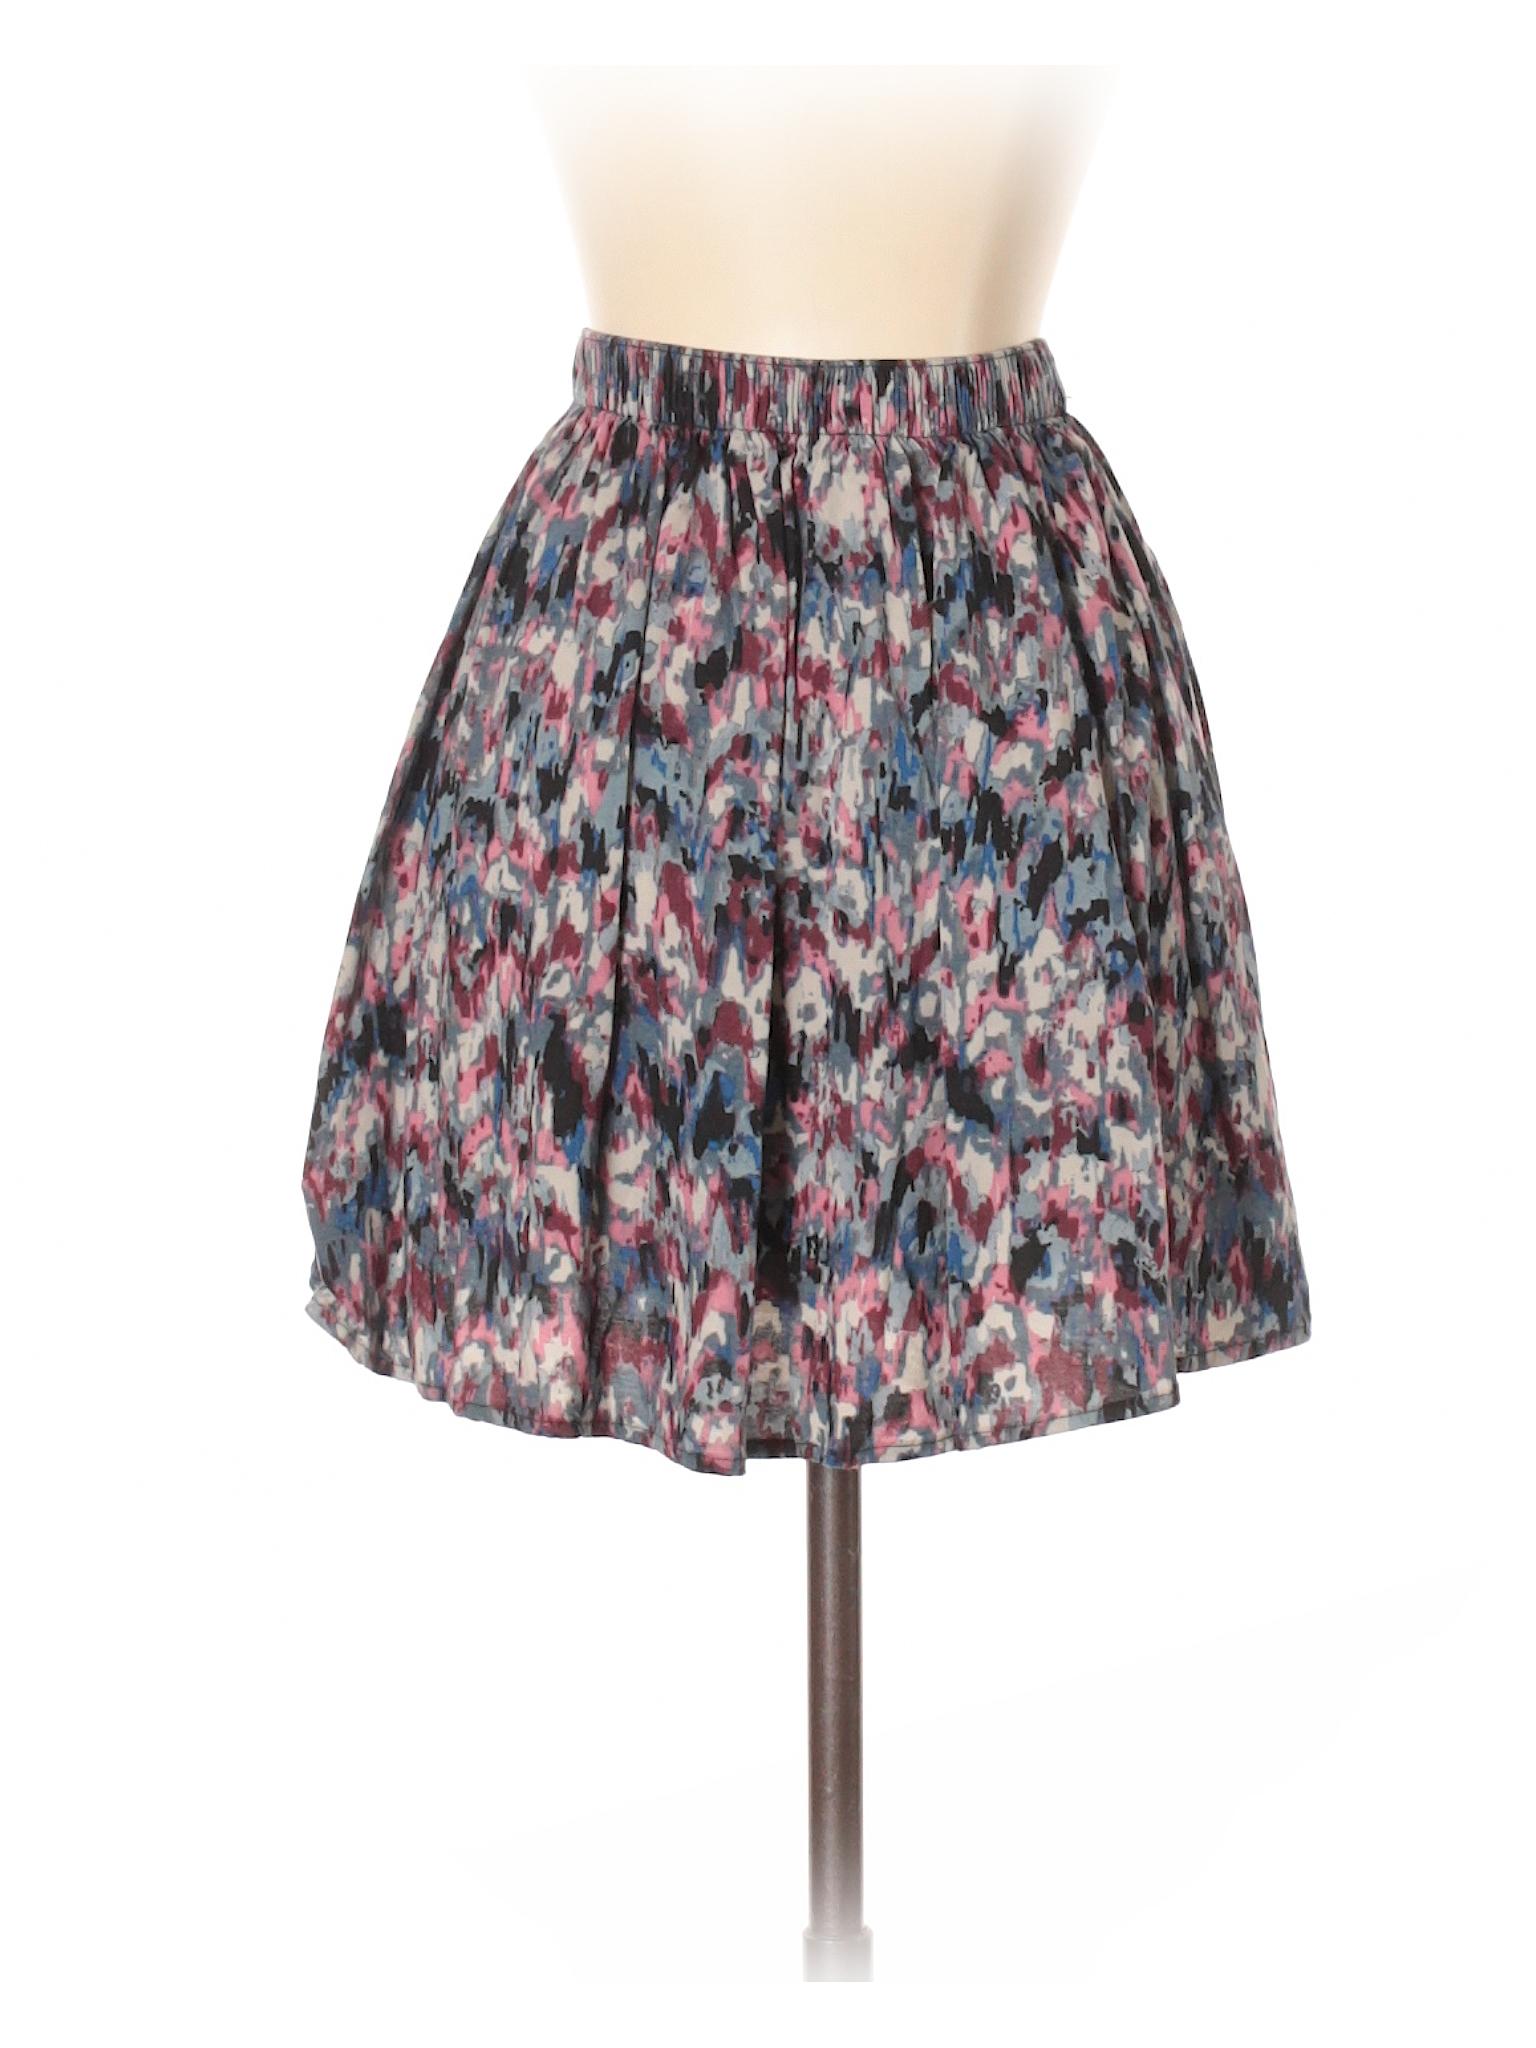 Casual Boutique Boutique Skirt Casual pa0xwnqEZ